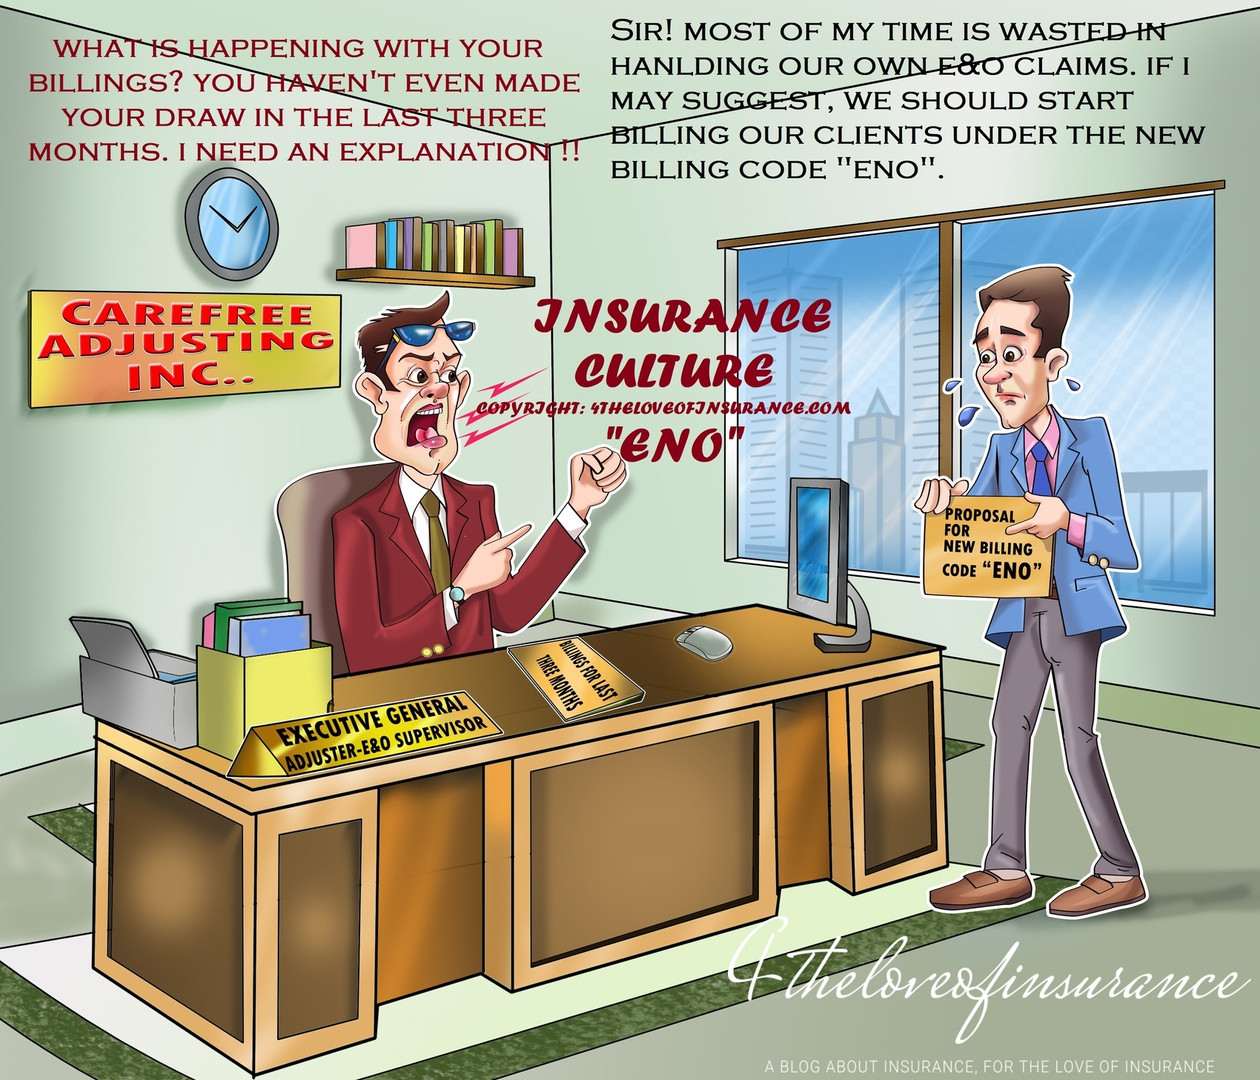 The Billing Code - ENO